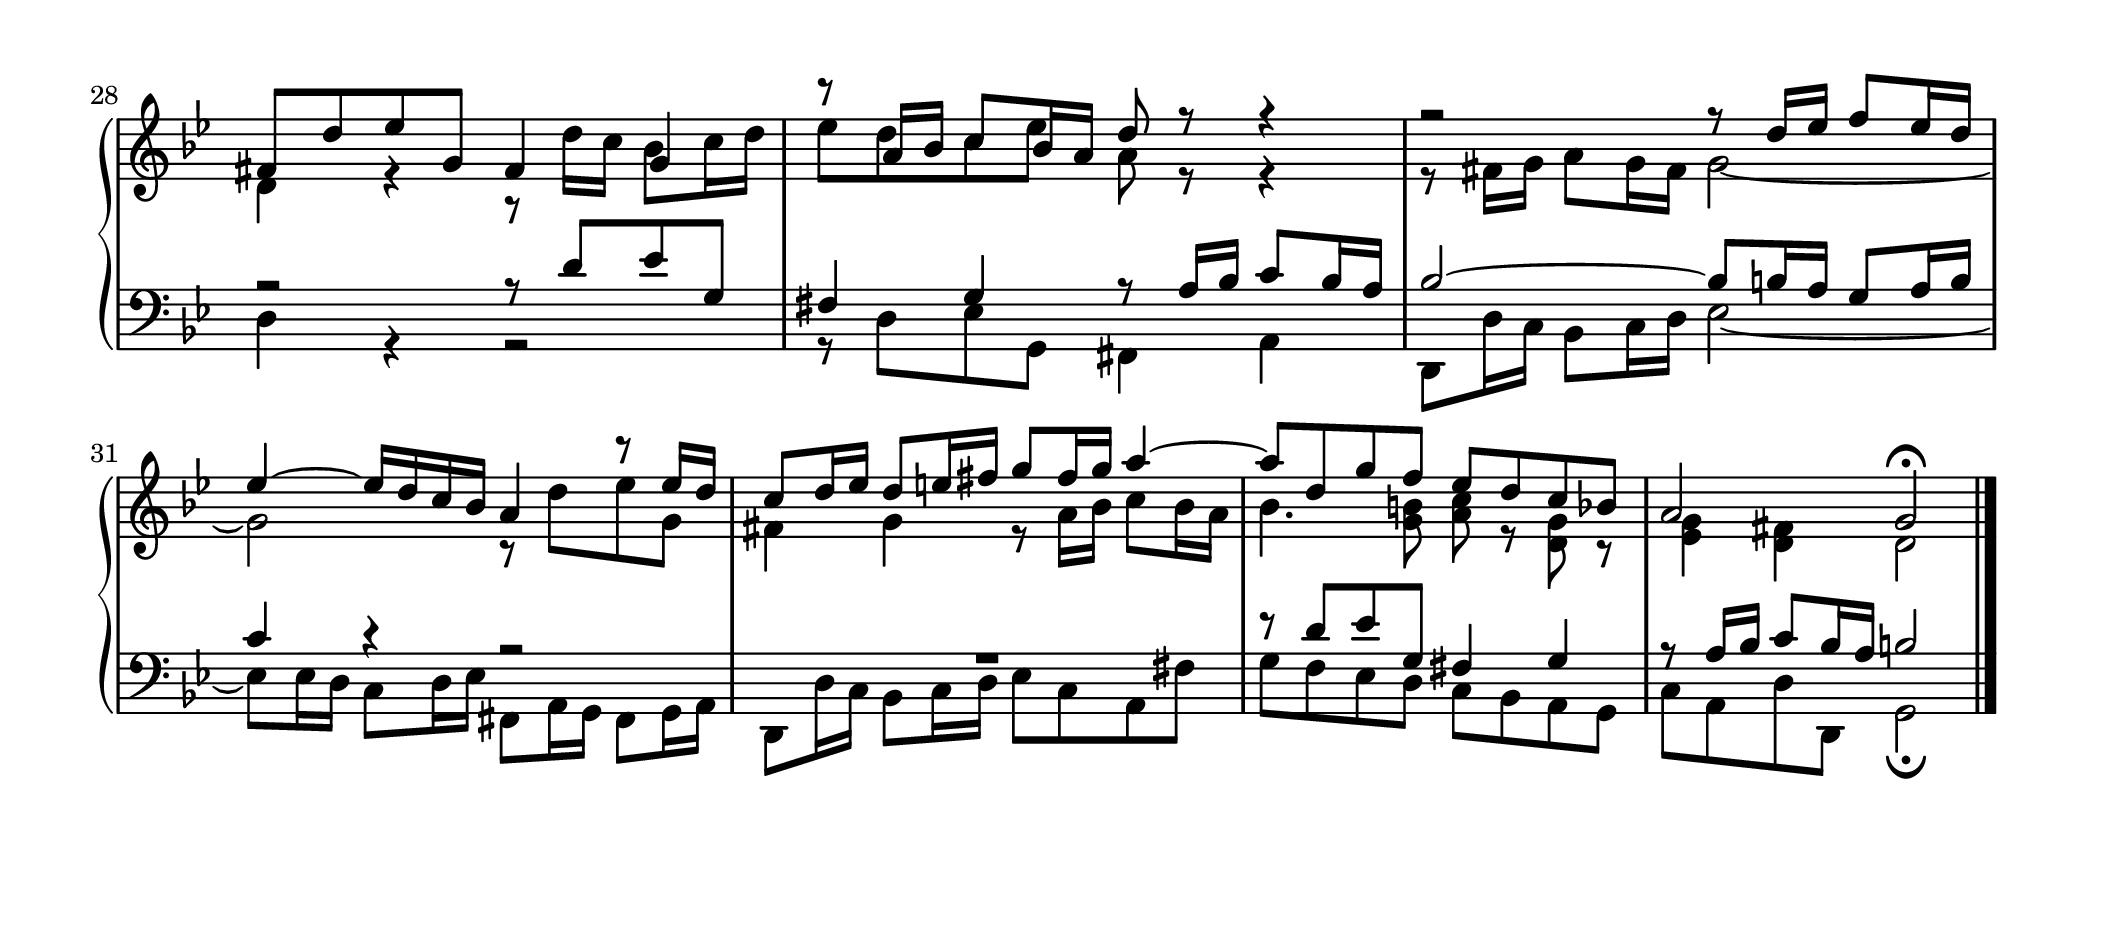 Lilypond Notation Fur Jedermann Lilypond Notensatz Fur Jedermann